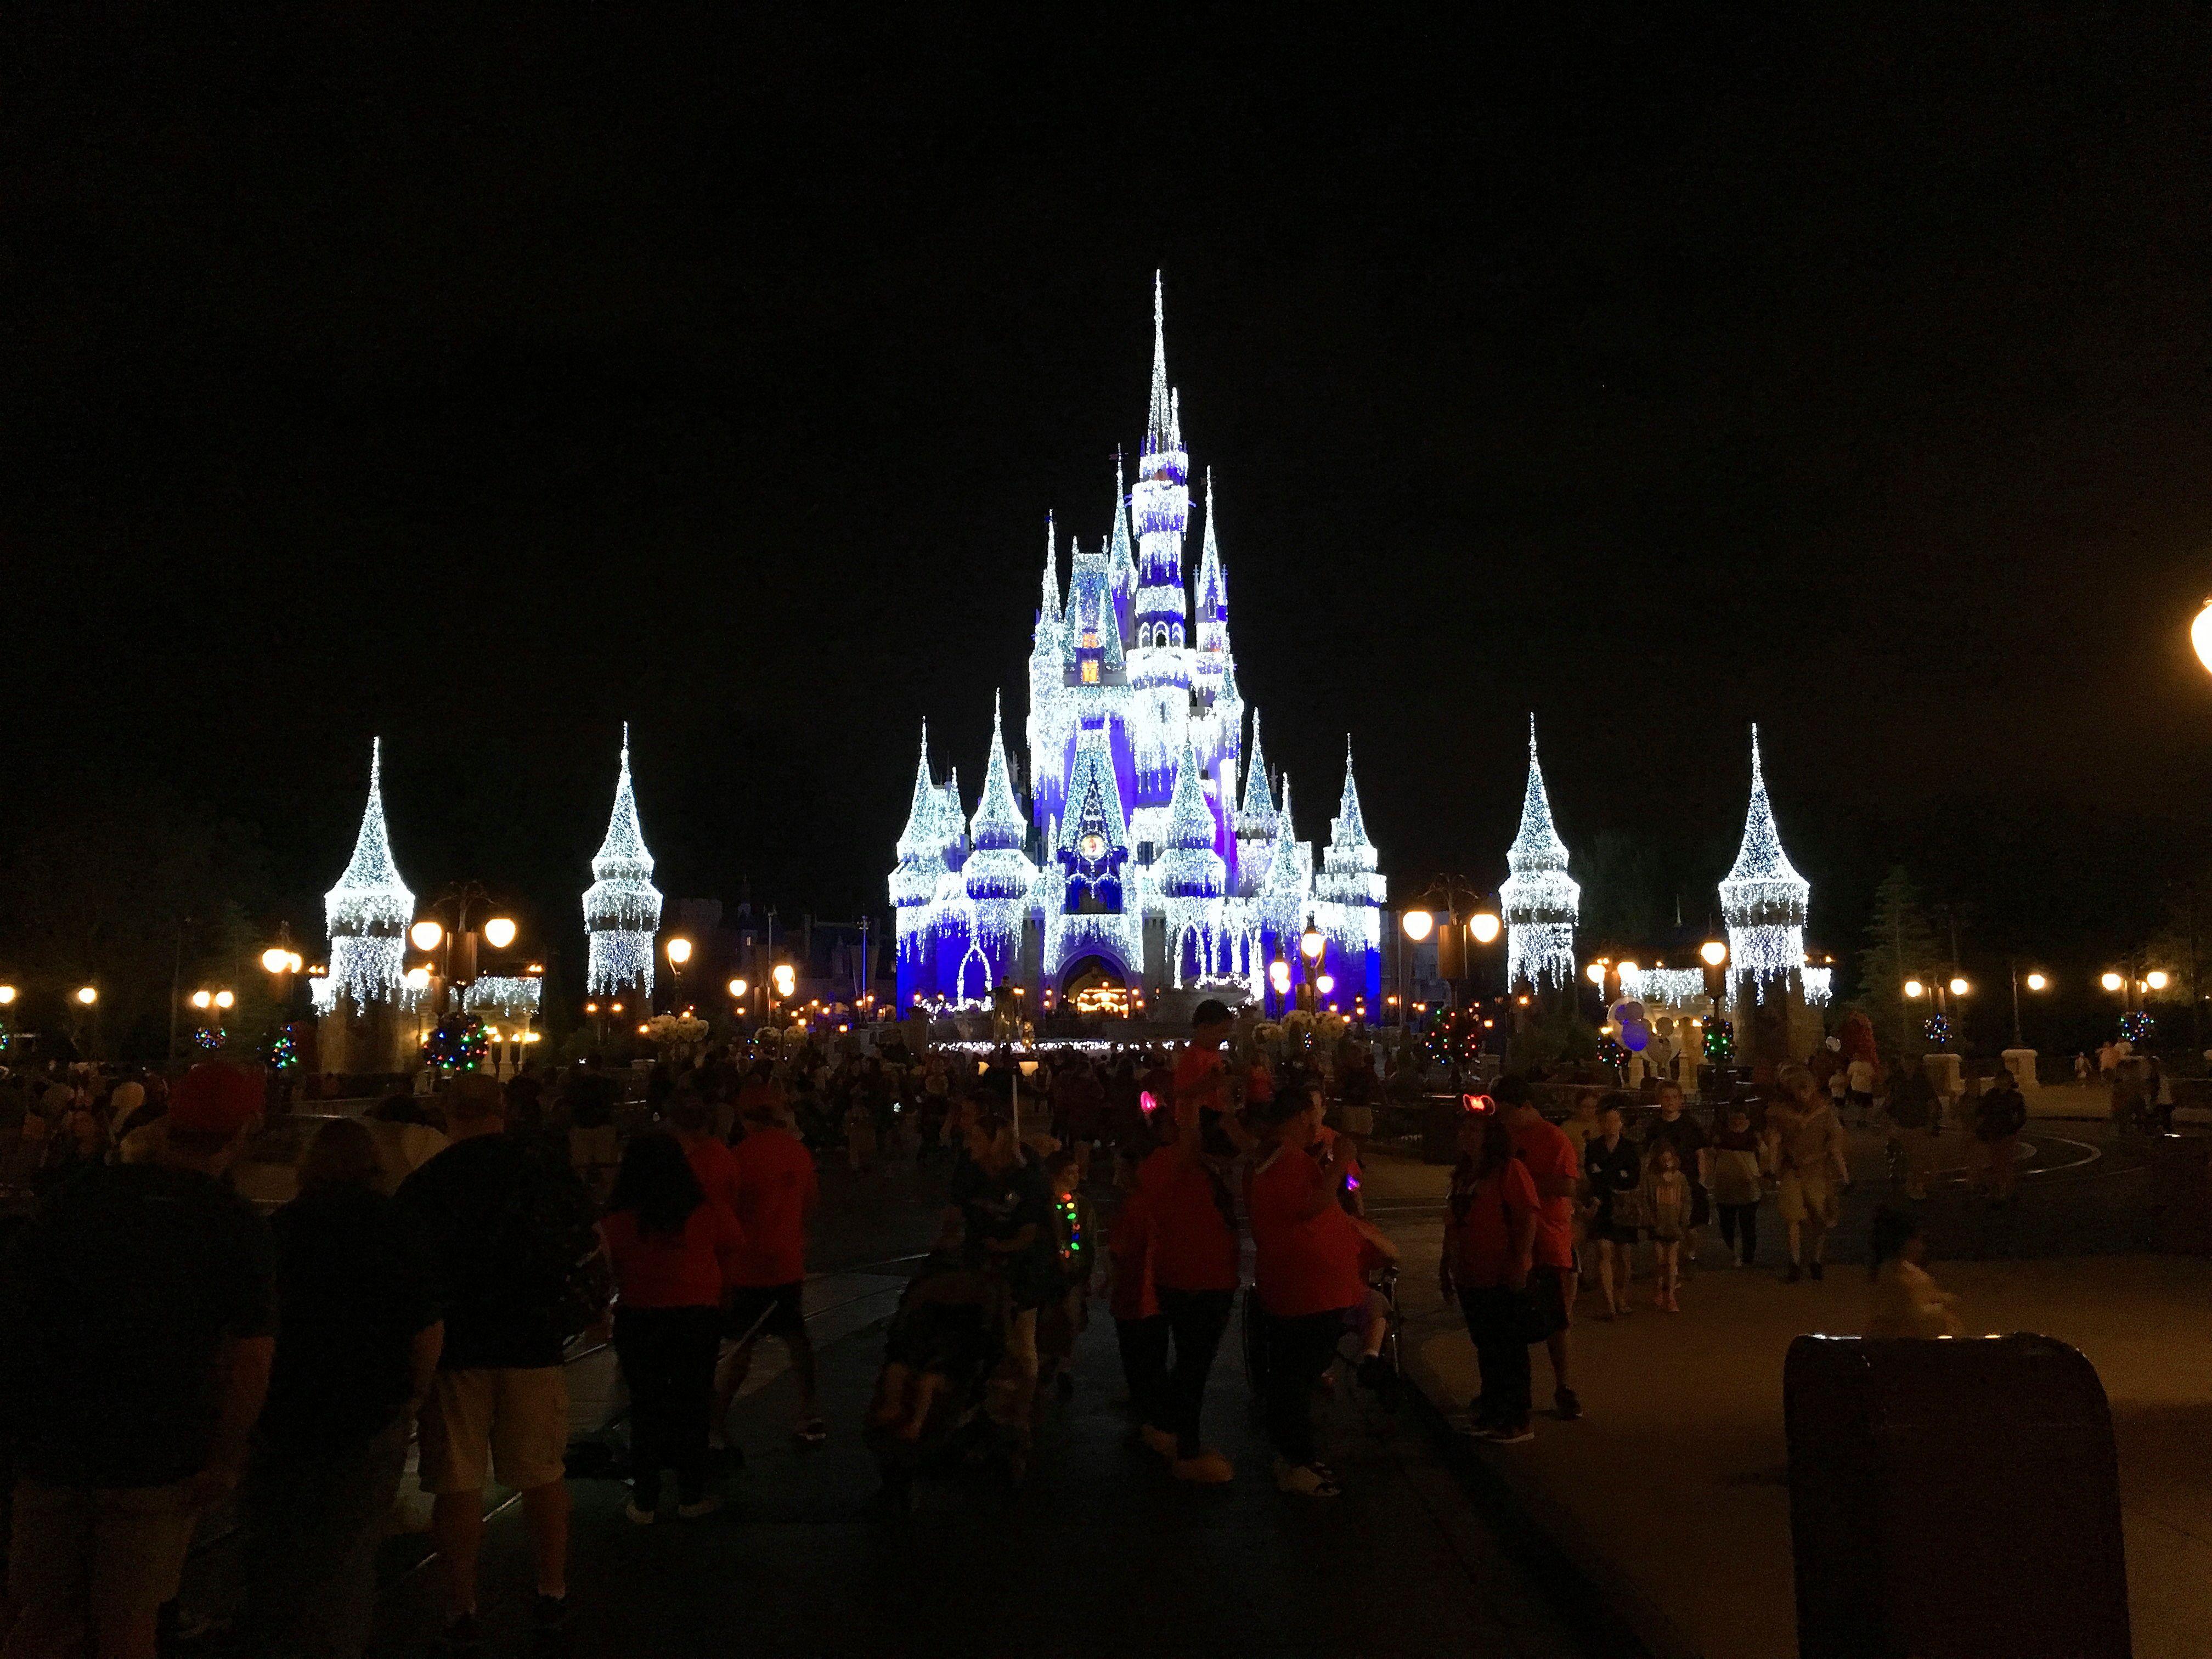 Magic Kingdom Cinderella Castle Holiday lighting scenery.